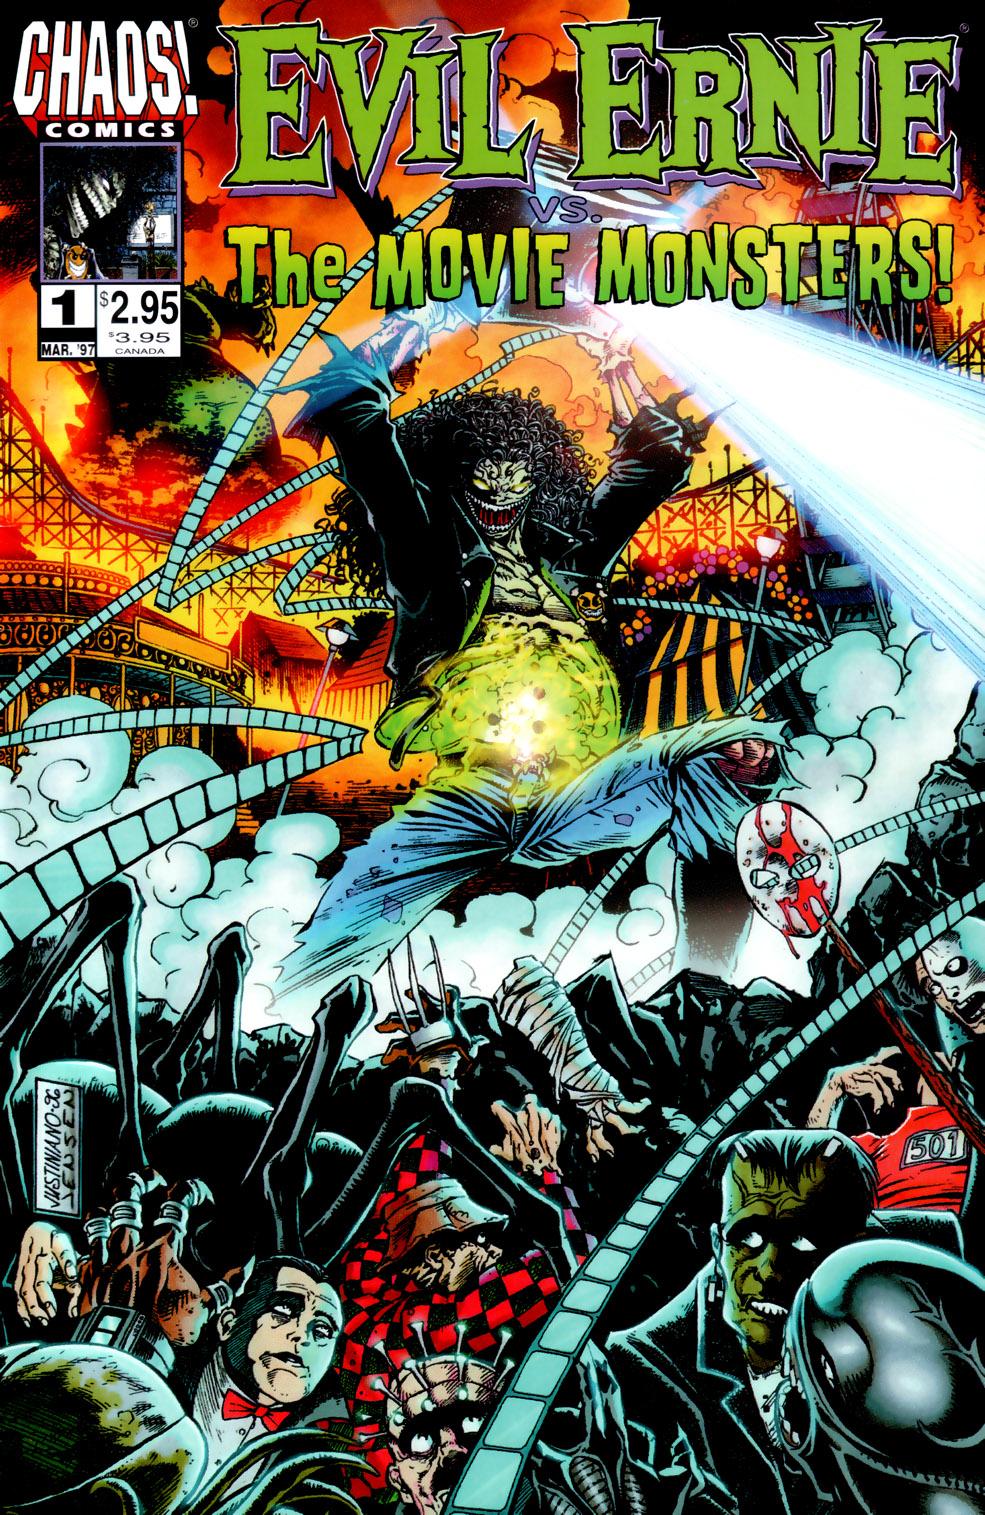 Evil Ernie vs. the Movie Monsters Full Page 1